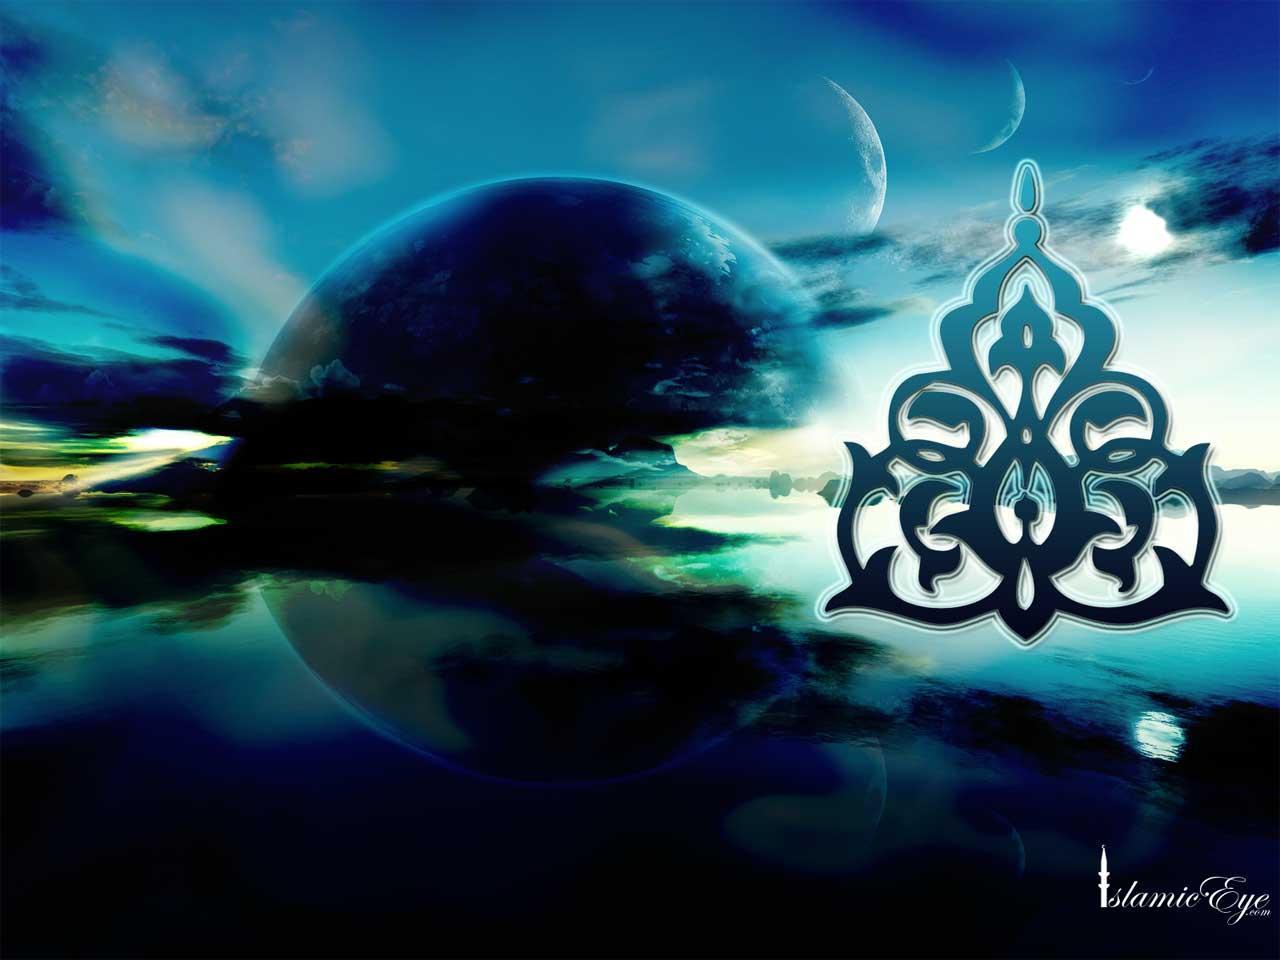 Free Download 3d Islamic Hd Wallpapers Wallpaper202